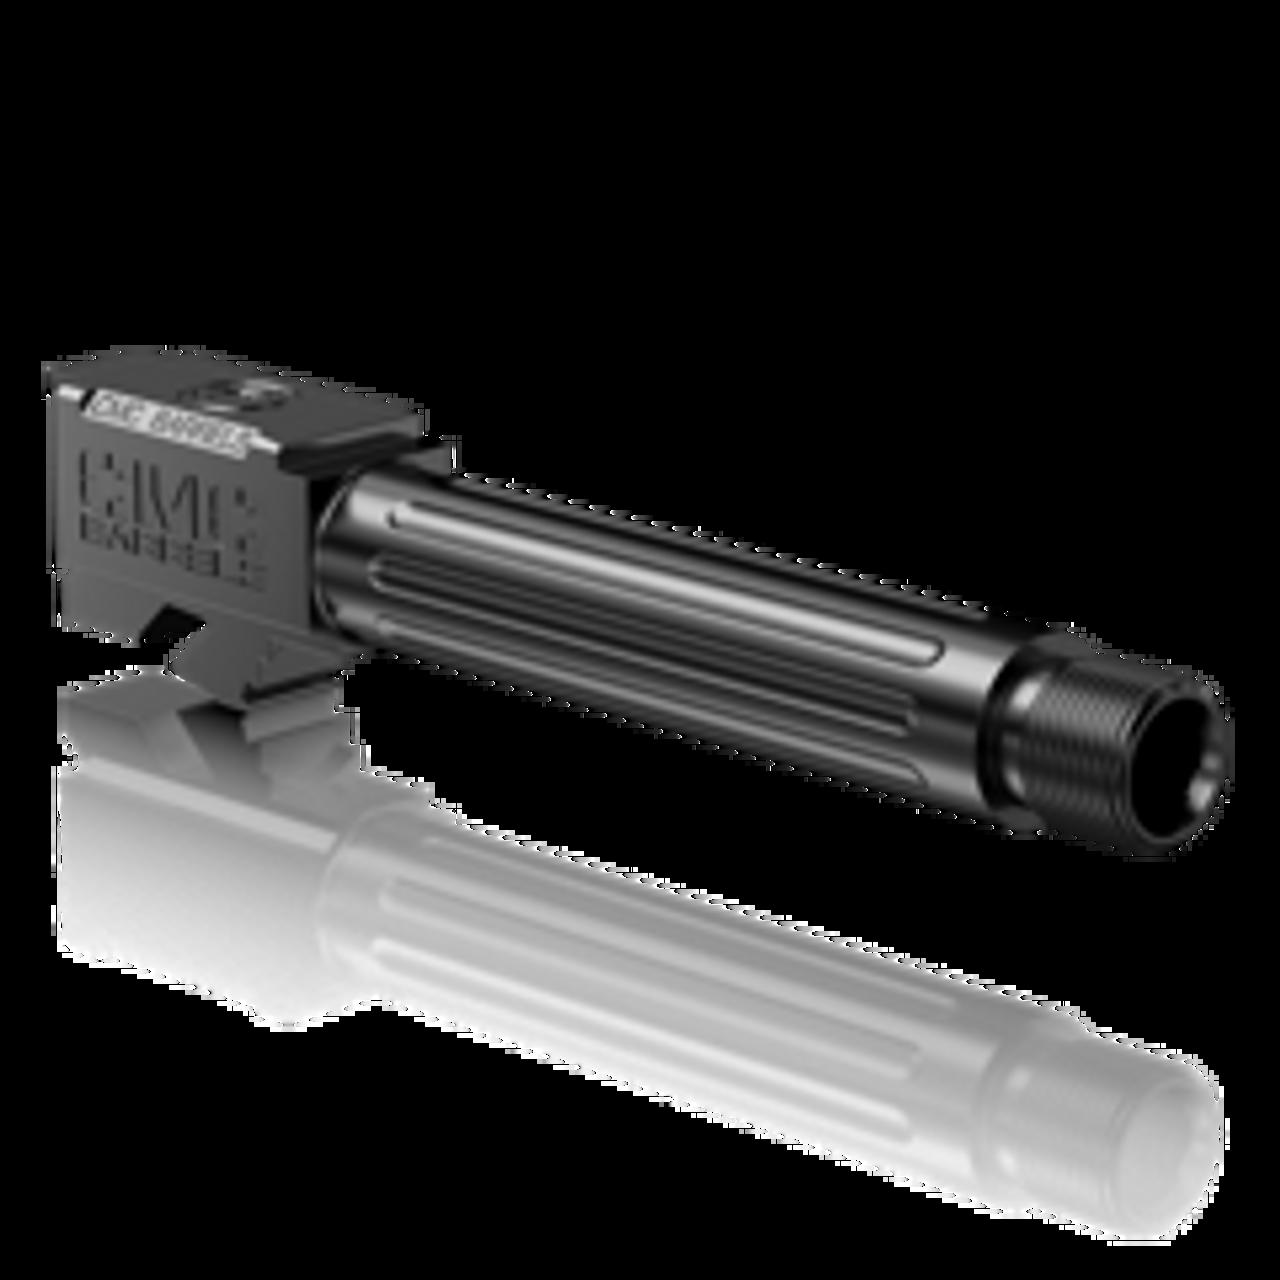 CMC Glock 19 Fluted Threaded 9mm Barrel (DLC Black)